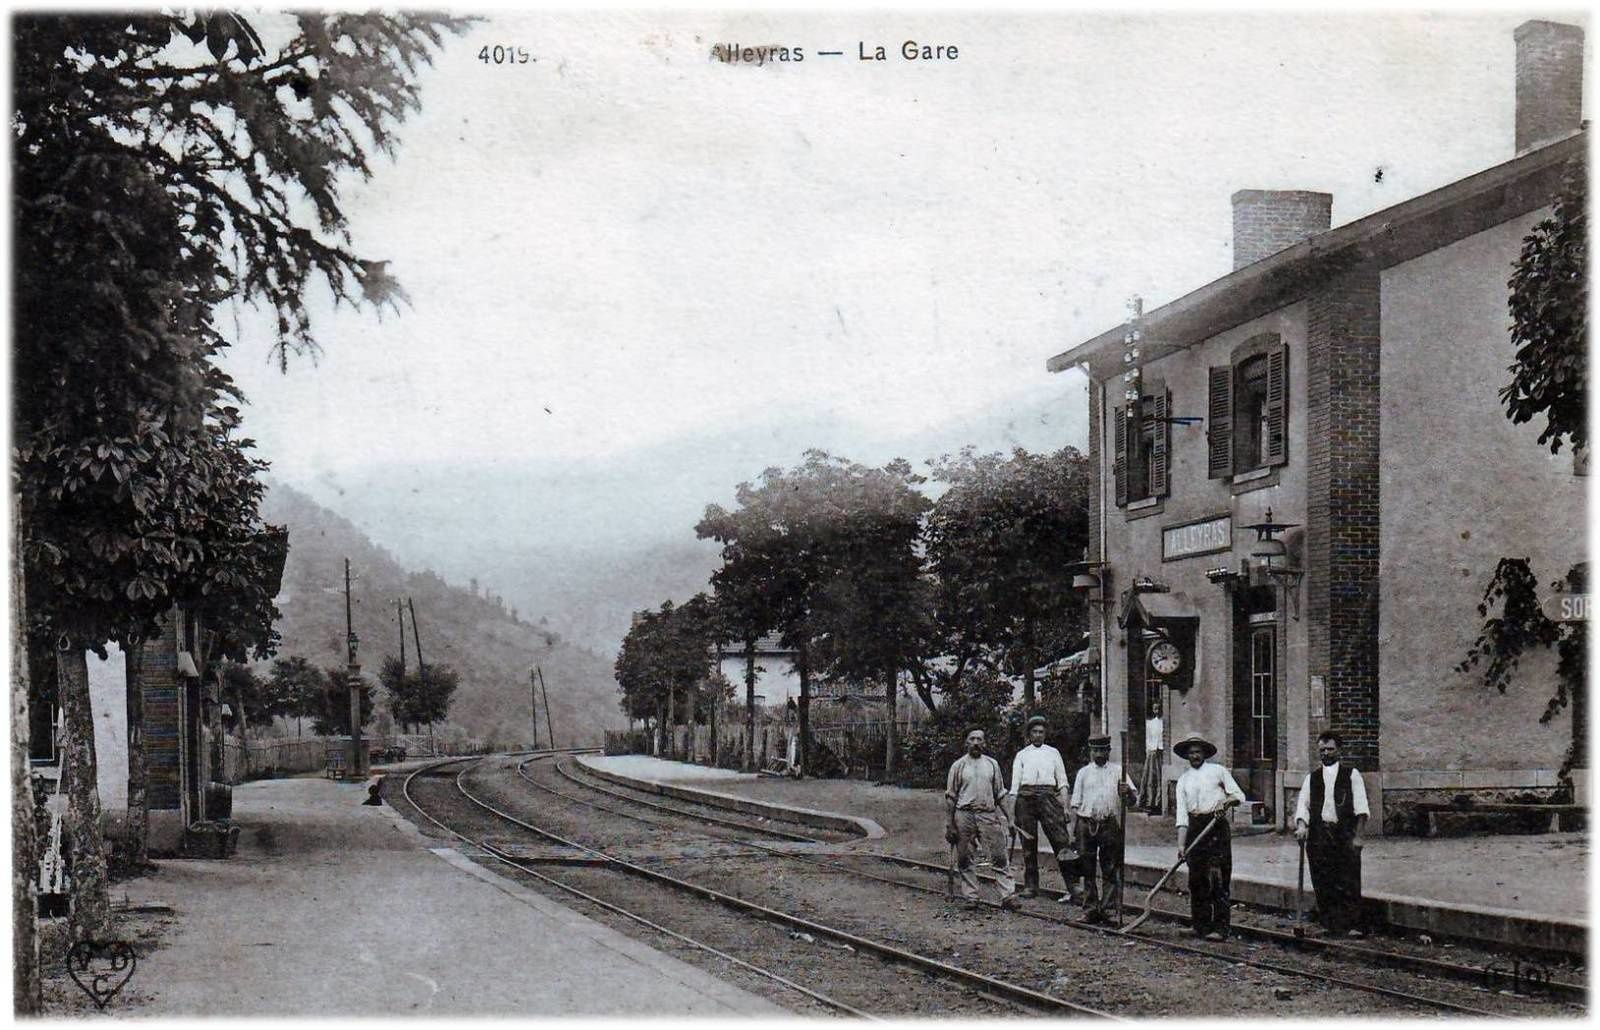 Pont d'Alleyras